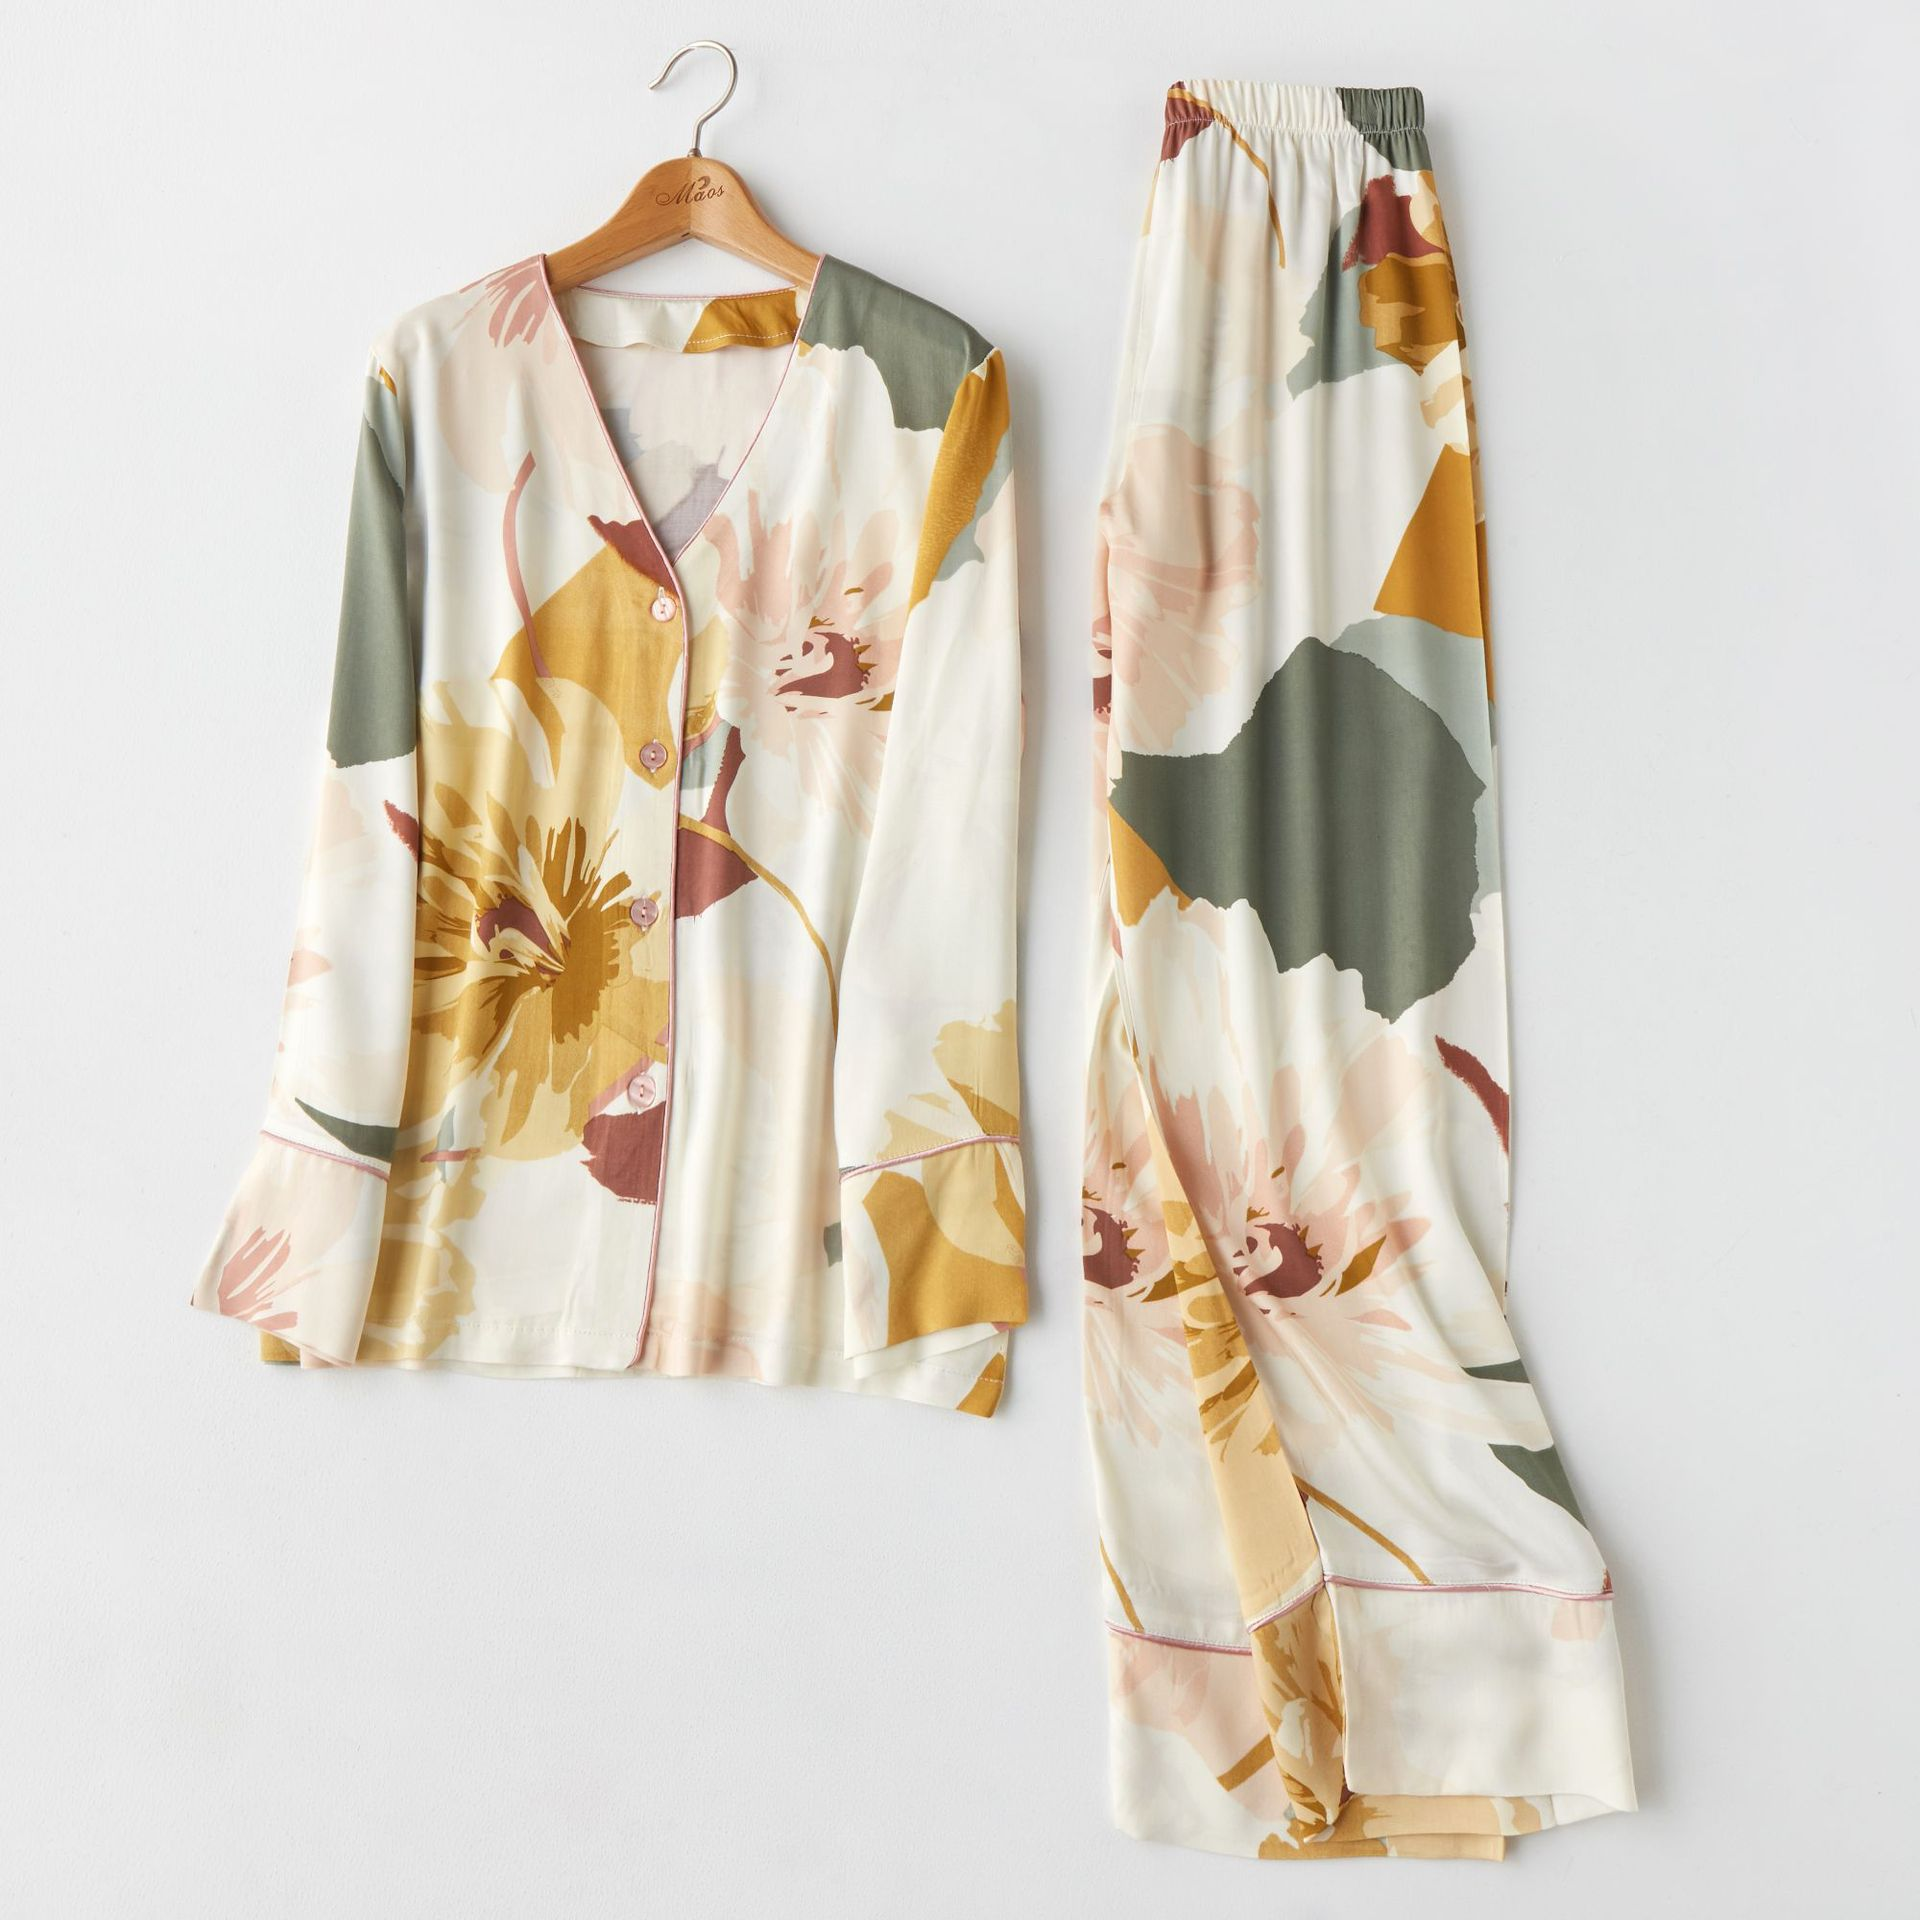 Autumn New Satin Floral Printing Pajamas Long Sleeve Pyjamas Women V-Neck Sexy Pijama Mujer Loungewear Home Clothes Sleep Set